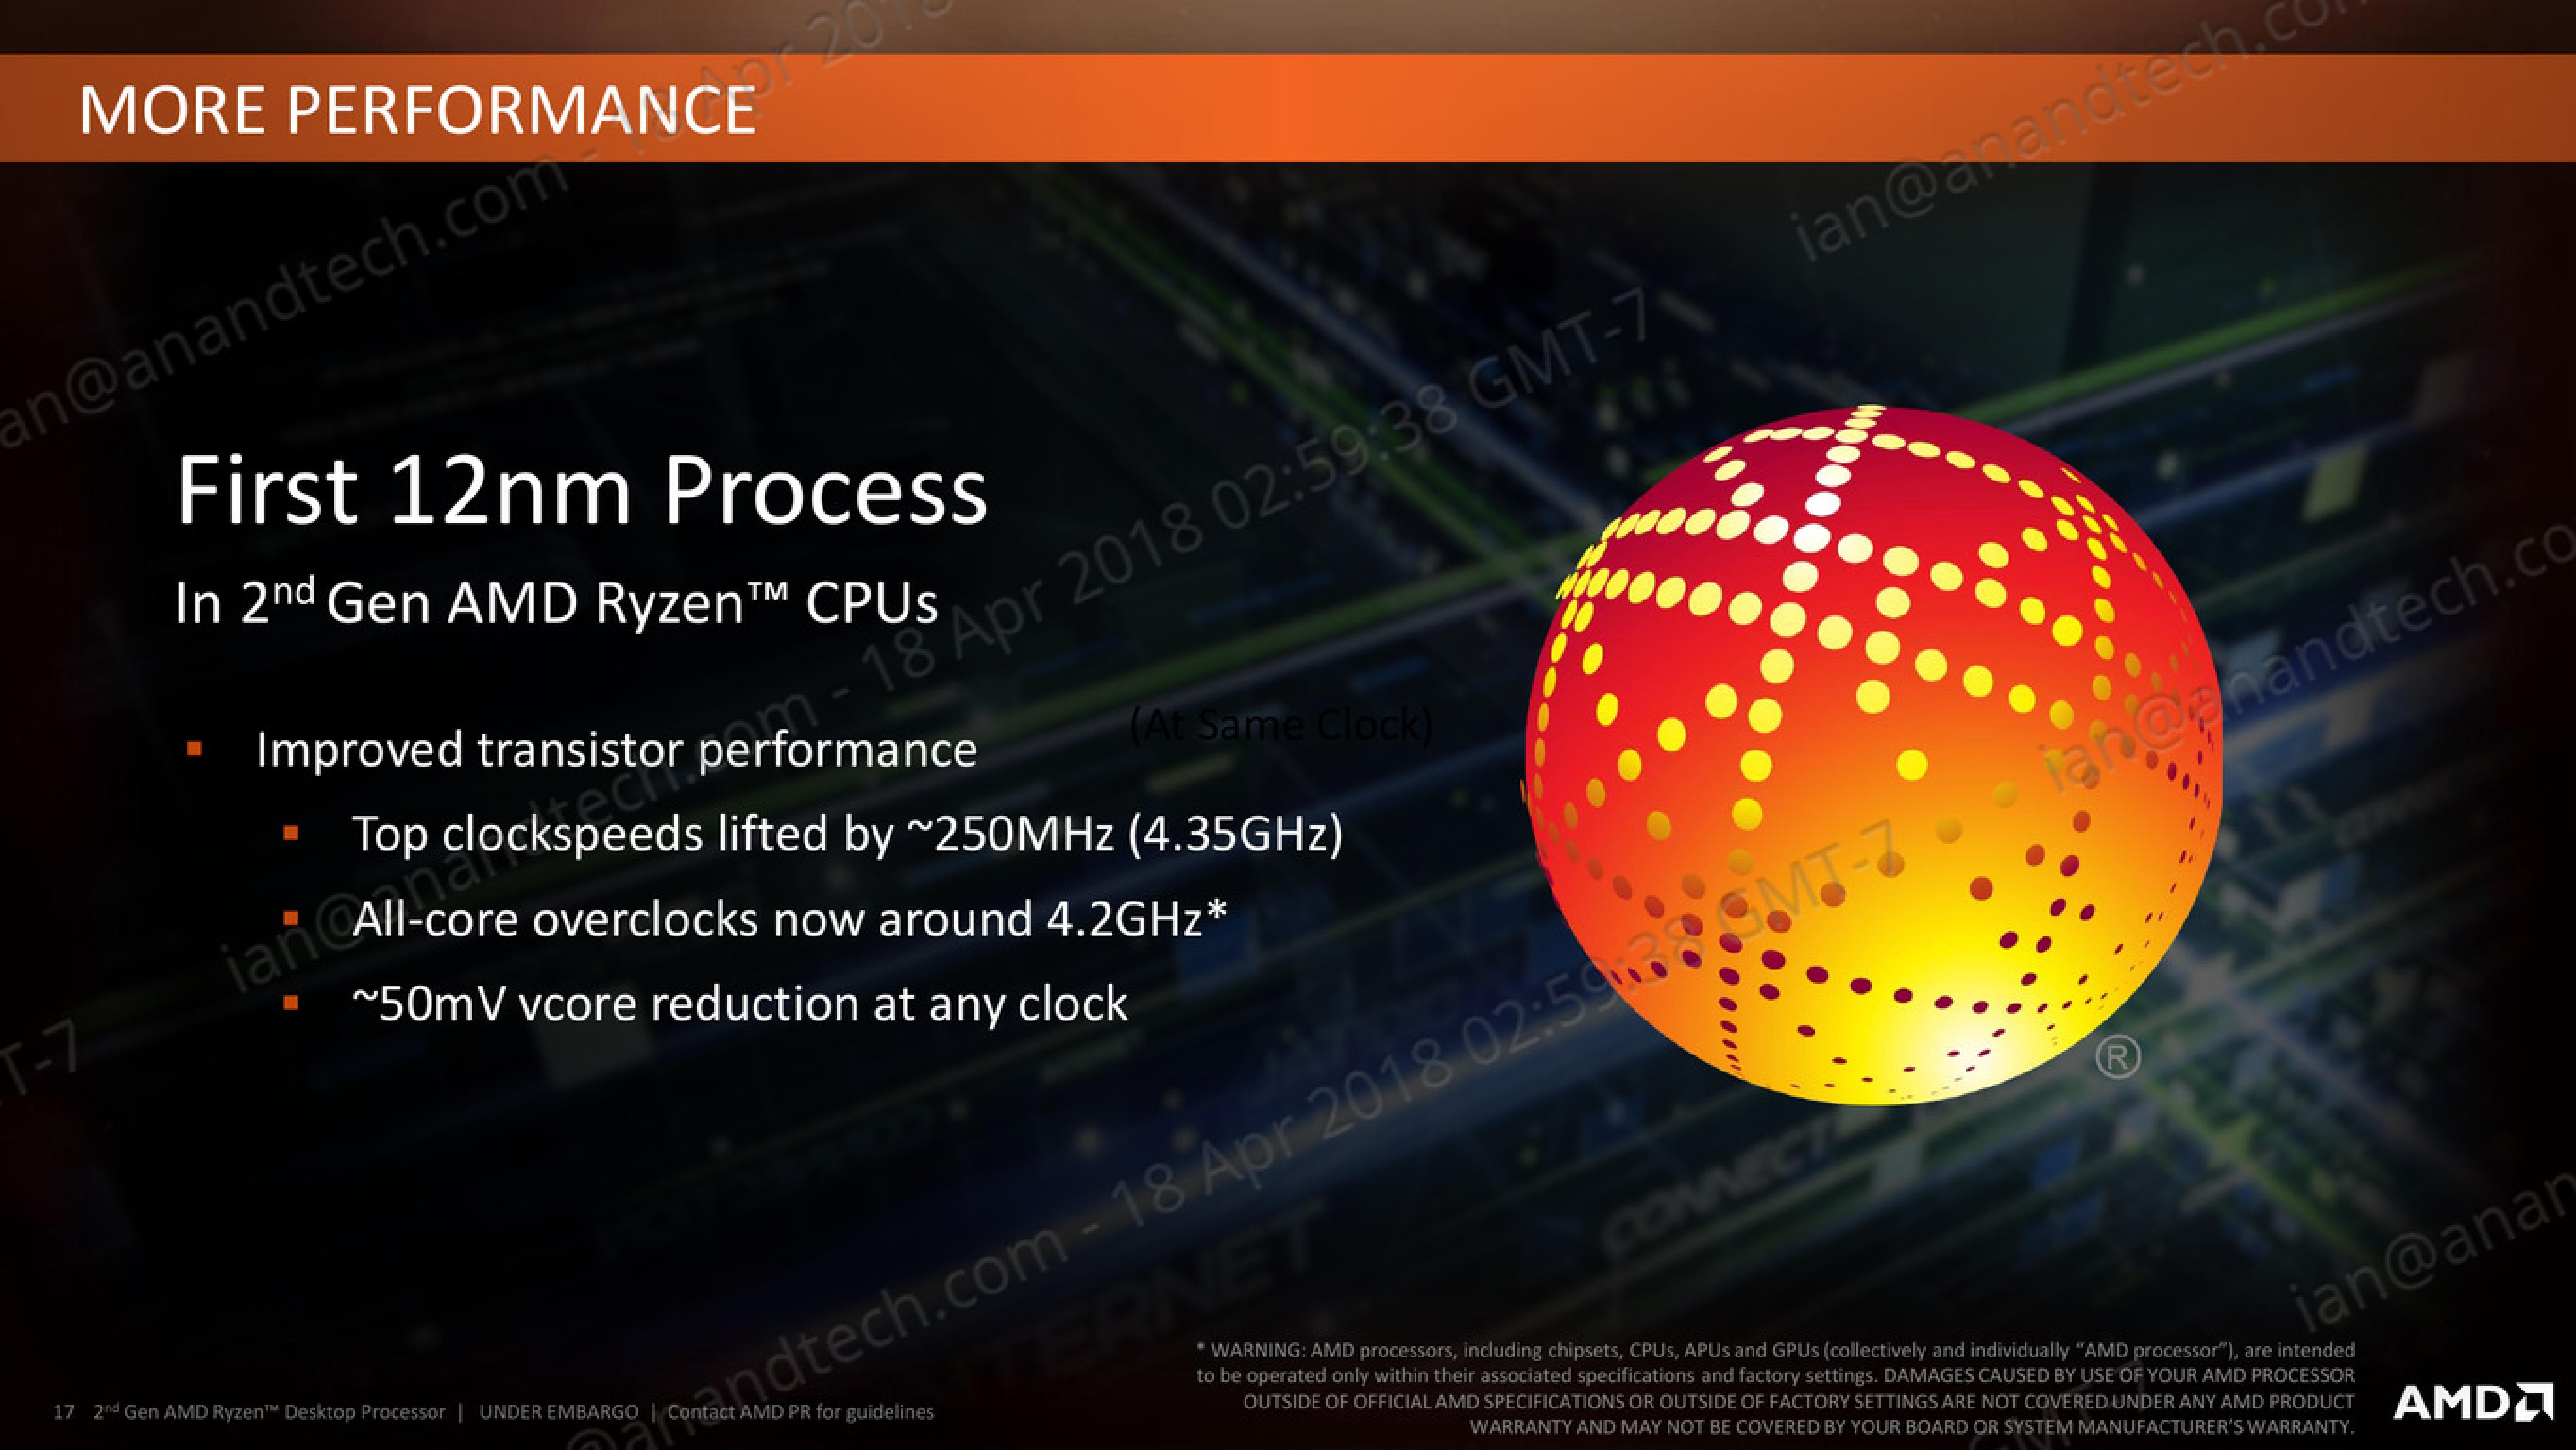 Talking 12nm and Zen+ - The AMD 2nd Gen Ryzen Deep Dive: The